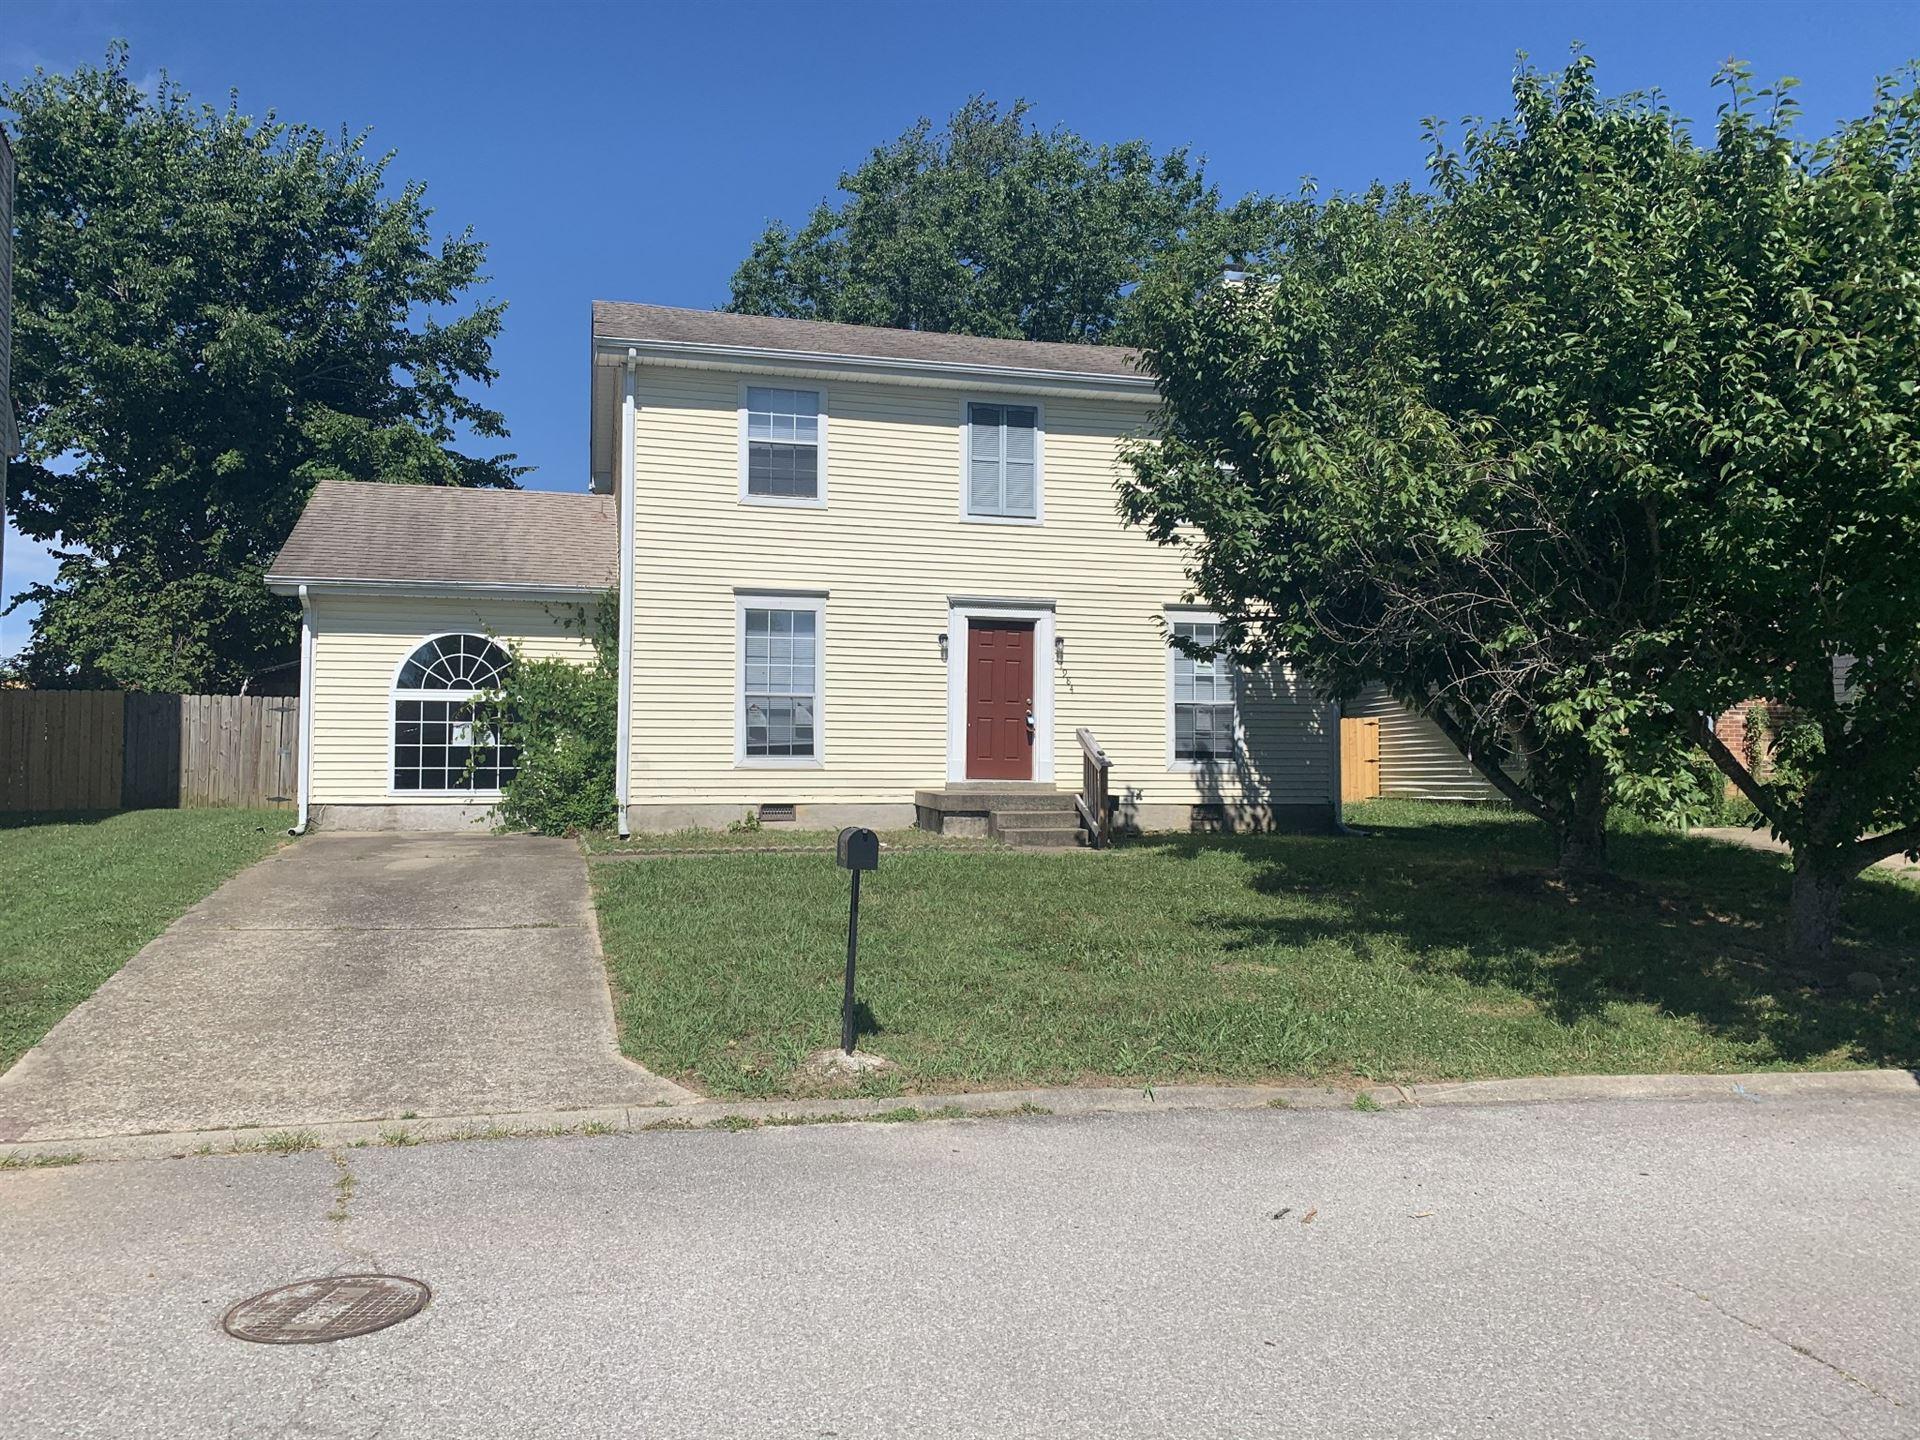 1984 Timberline Way, Clarksville, TN 37042 - MLS#: 2275851